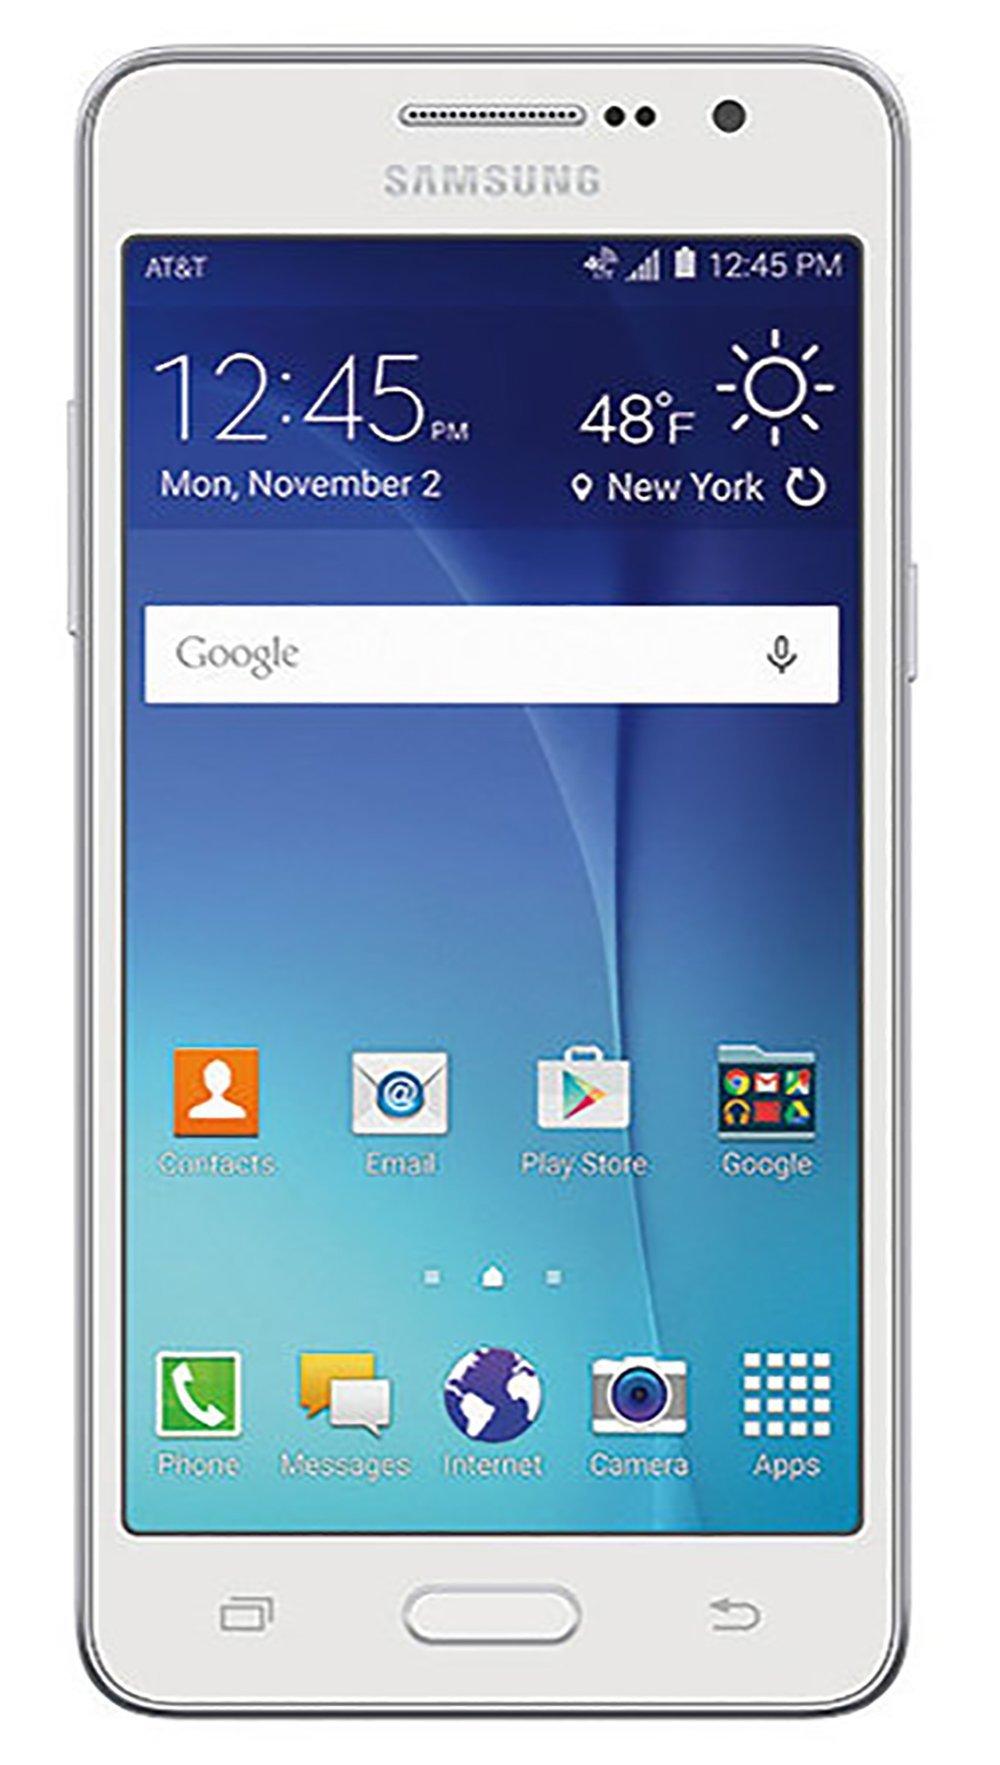 Samsung Galaxy Grand Prime Smartphone - Unlocked - White